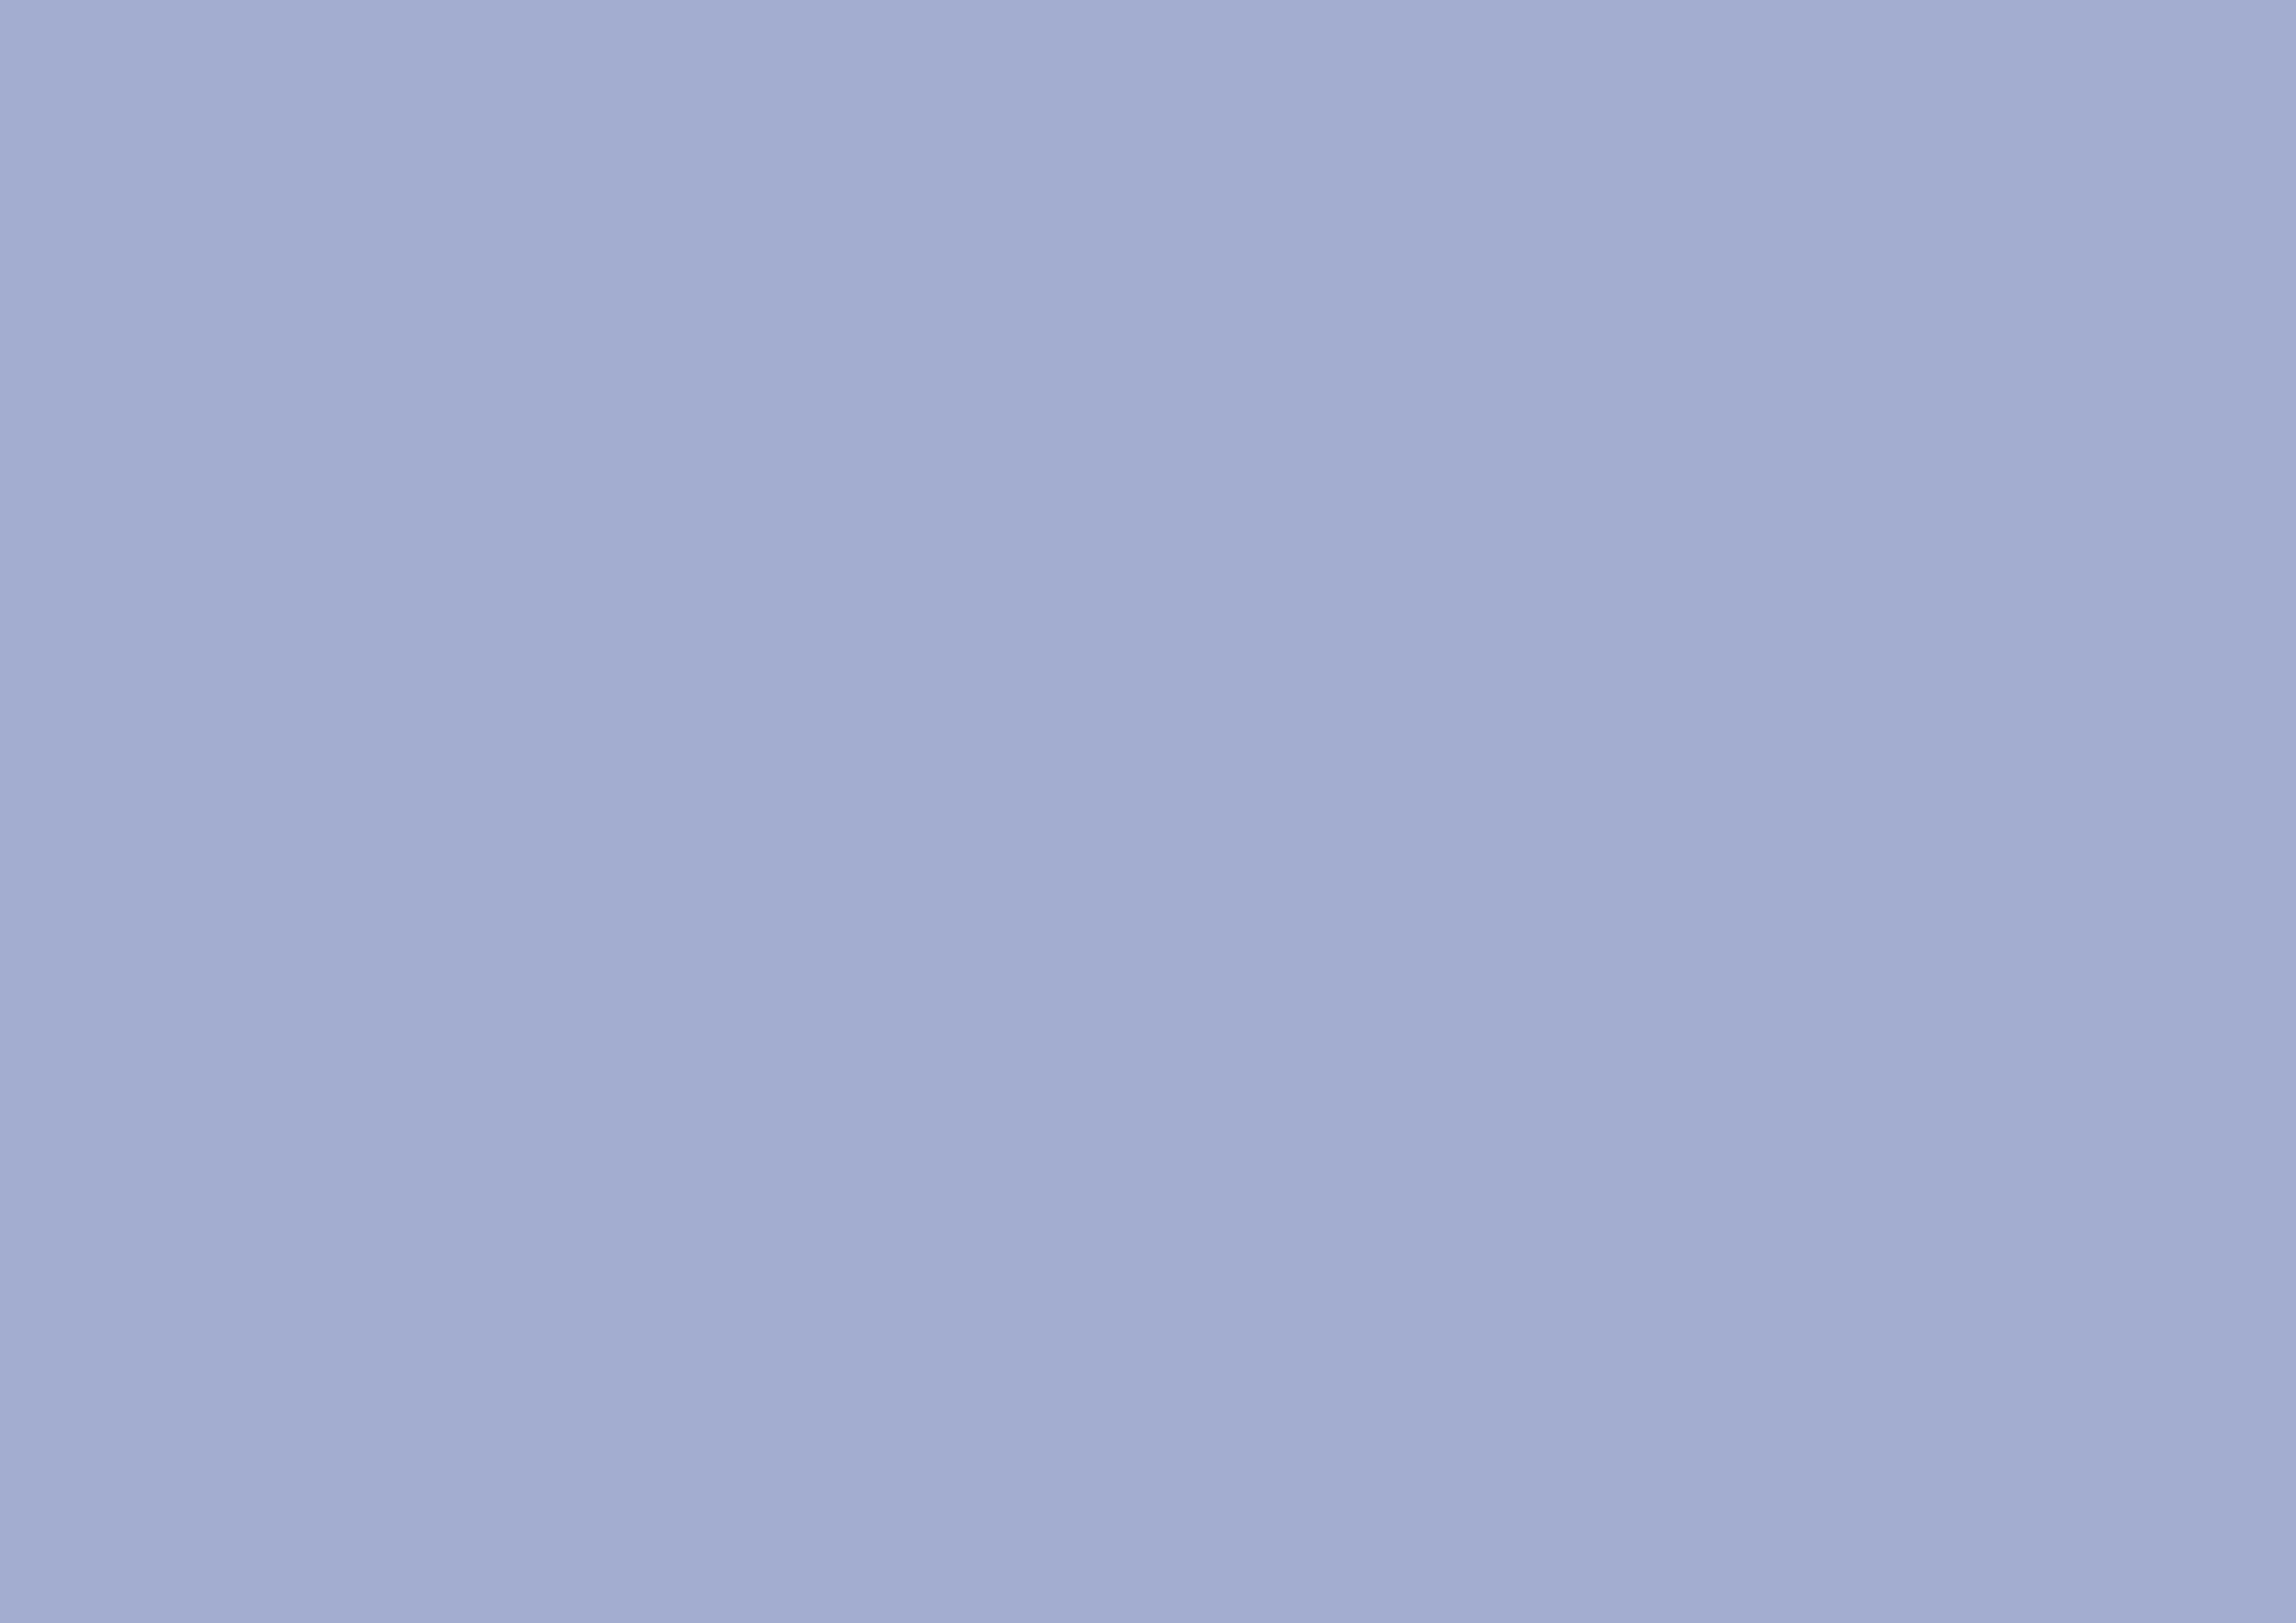 3508x2480 Wild Blue Yonder Solid Color Background